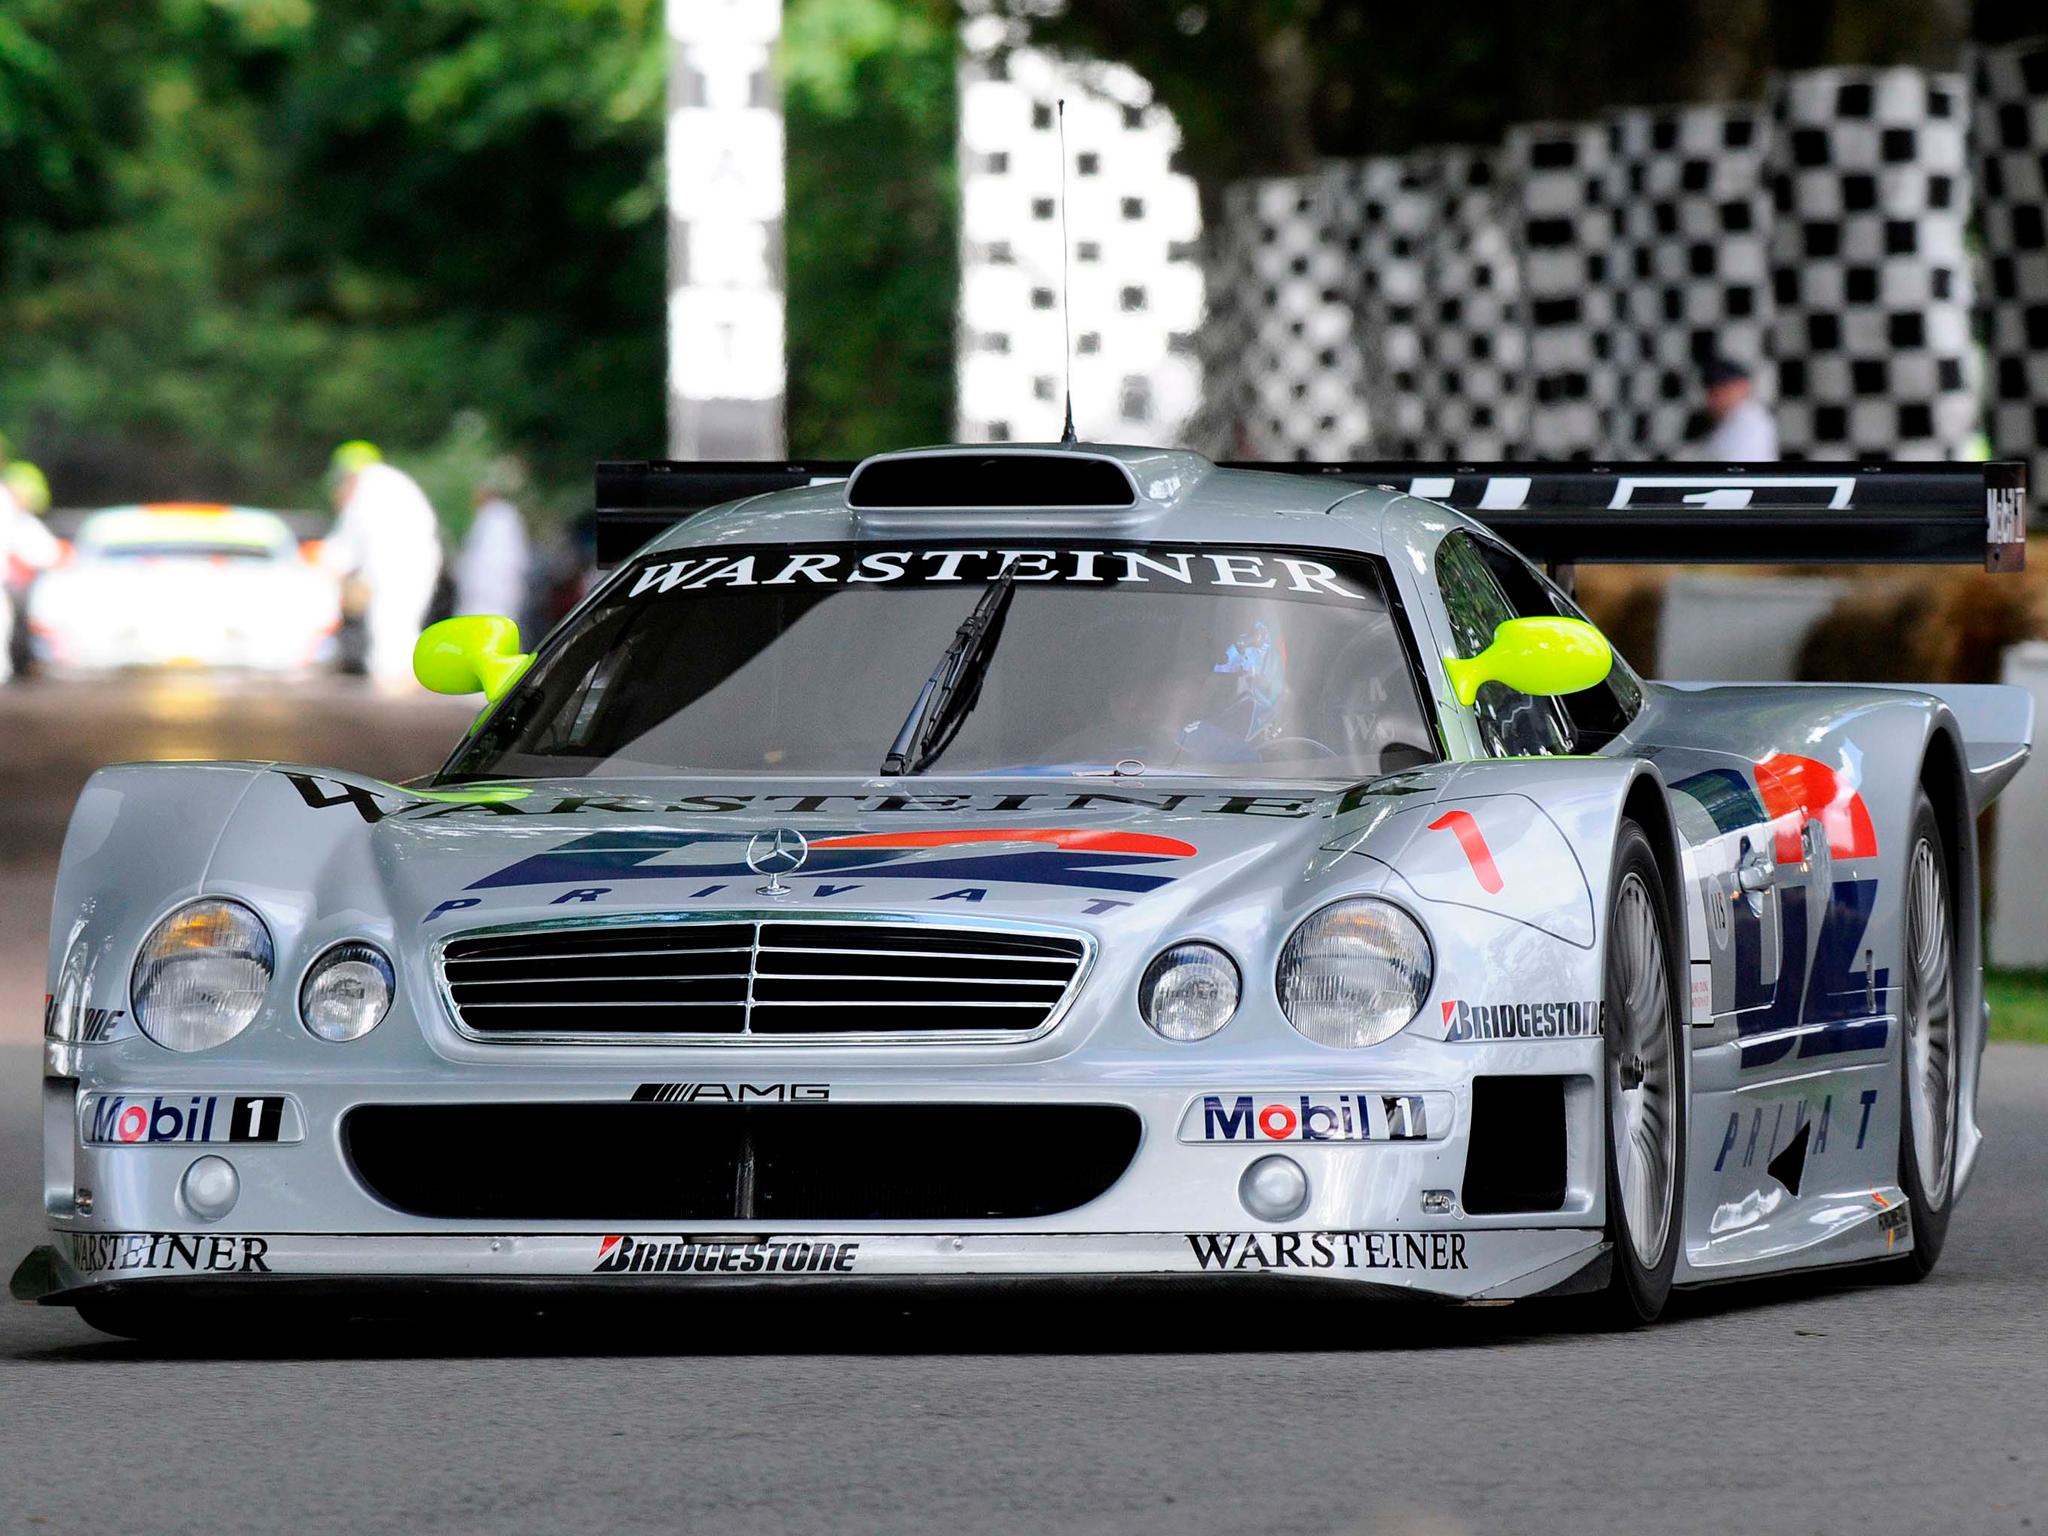 Mercedes Benz CLK GTR AMG supercar supercars race racing ...